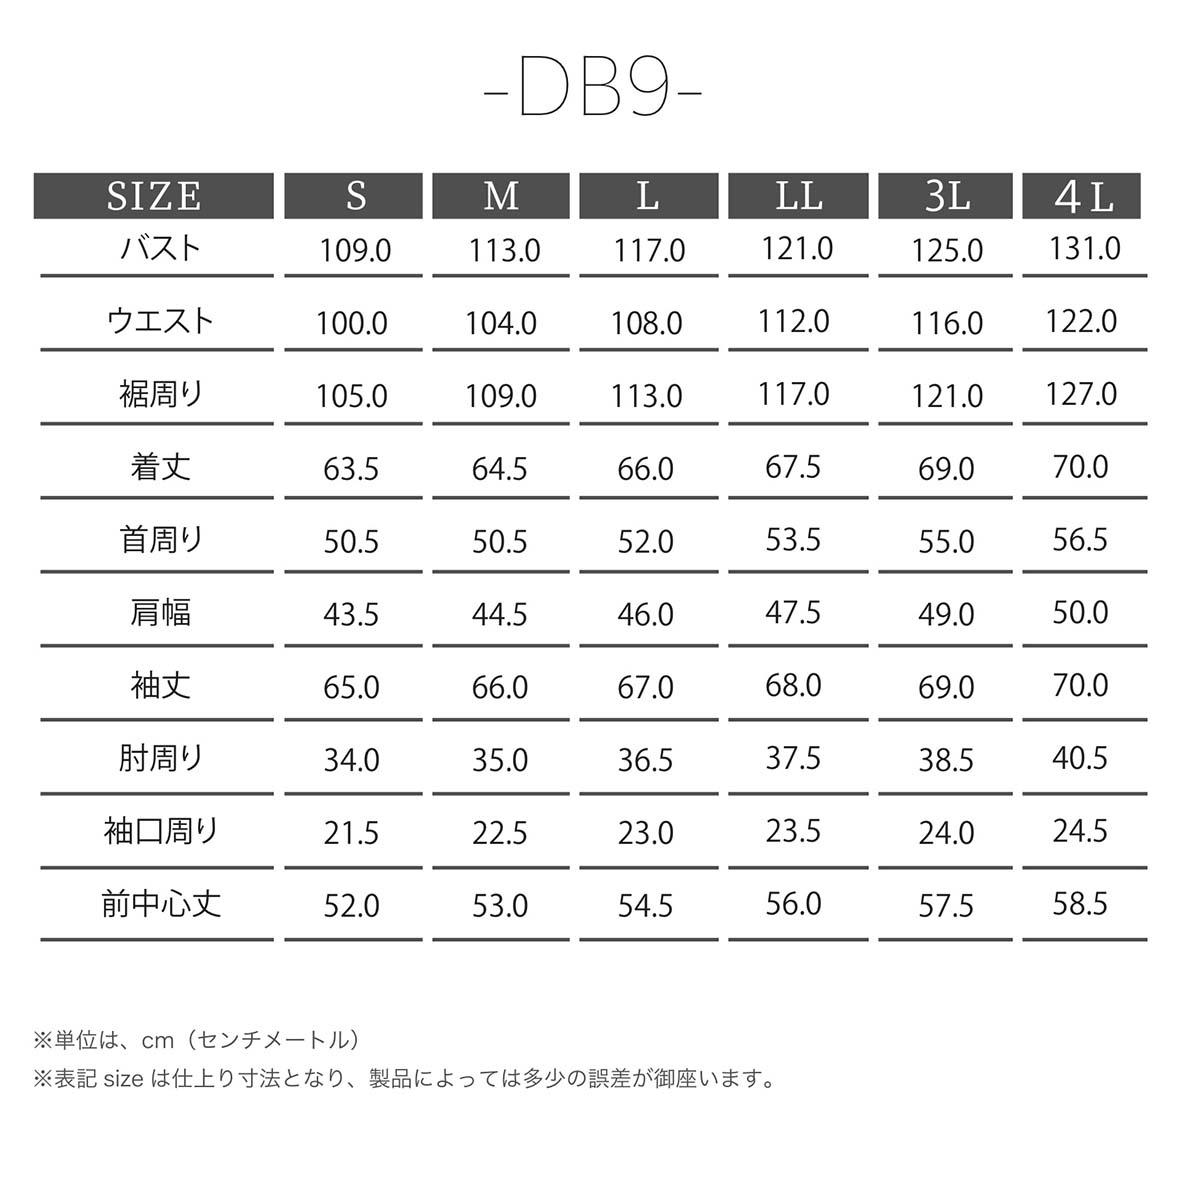 KADOYA(カドヤ) K'S LEATHER  DB9 ダイヤモンドキルティング レザージャケット ブラック